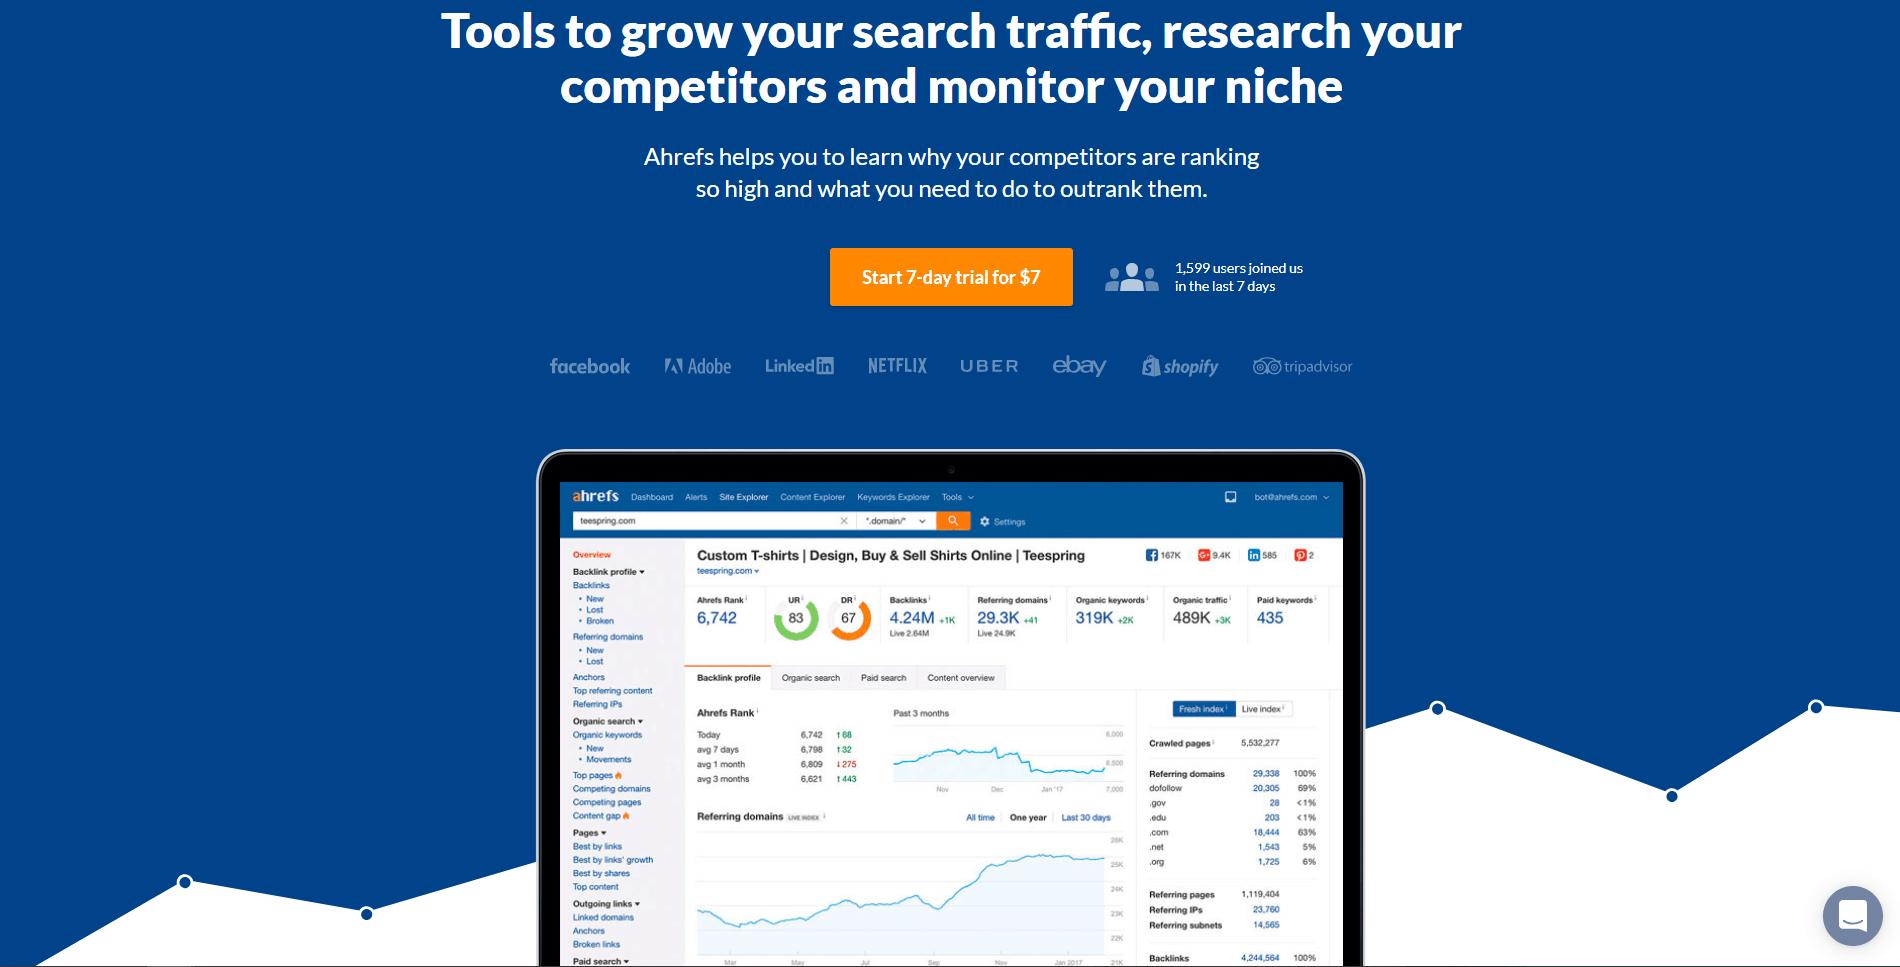 seo tools agencies use